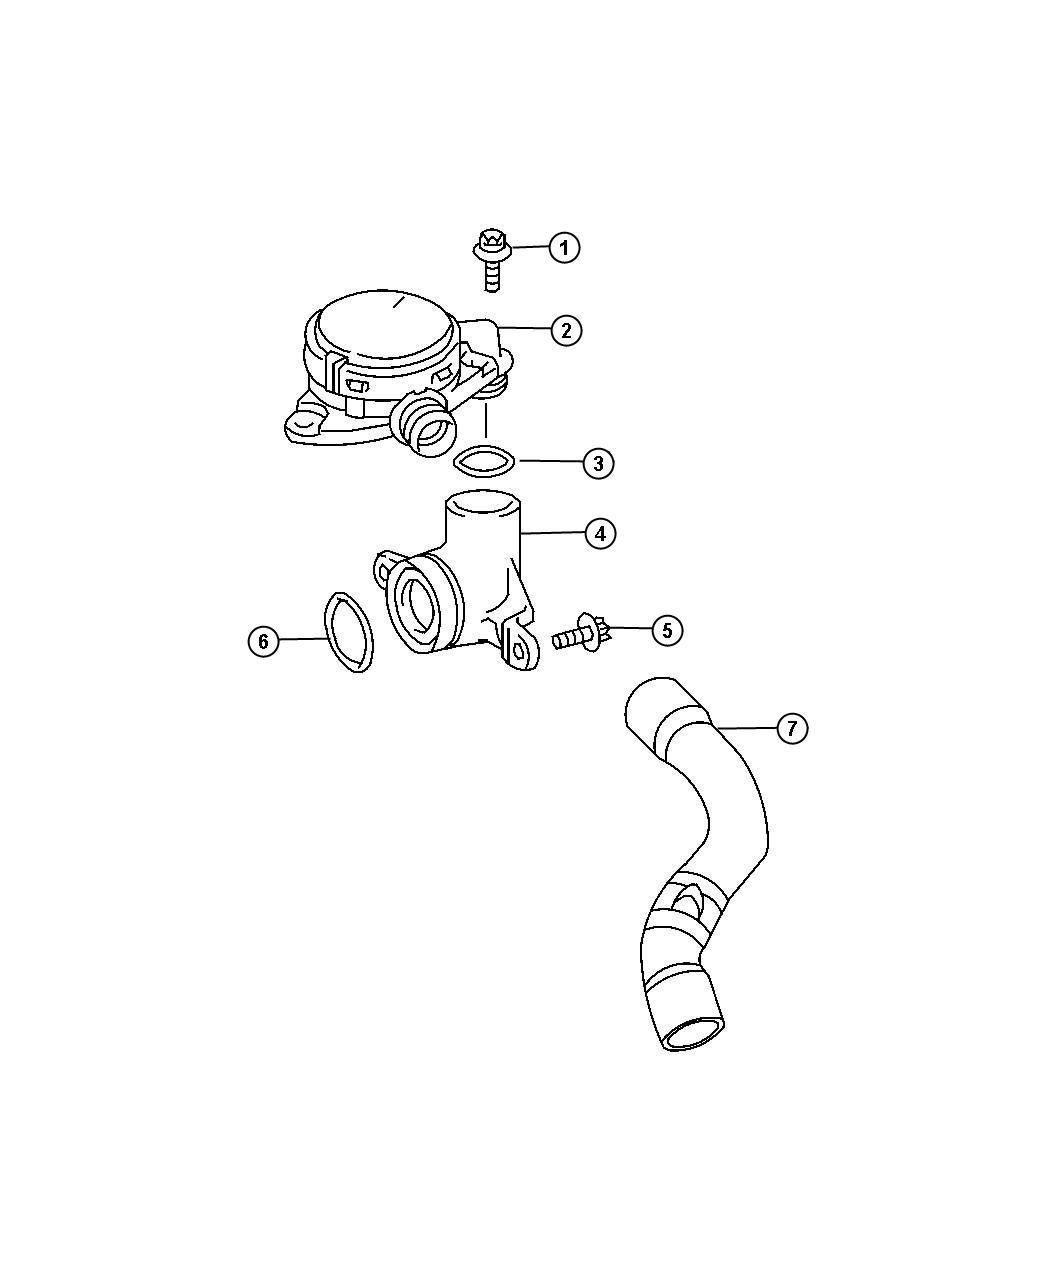 Dodge Sprinter Valve Pcv Pressure Control Valve Zj9 Engine Crankcase Ventilation